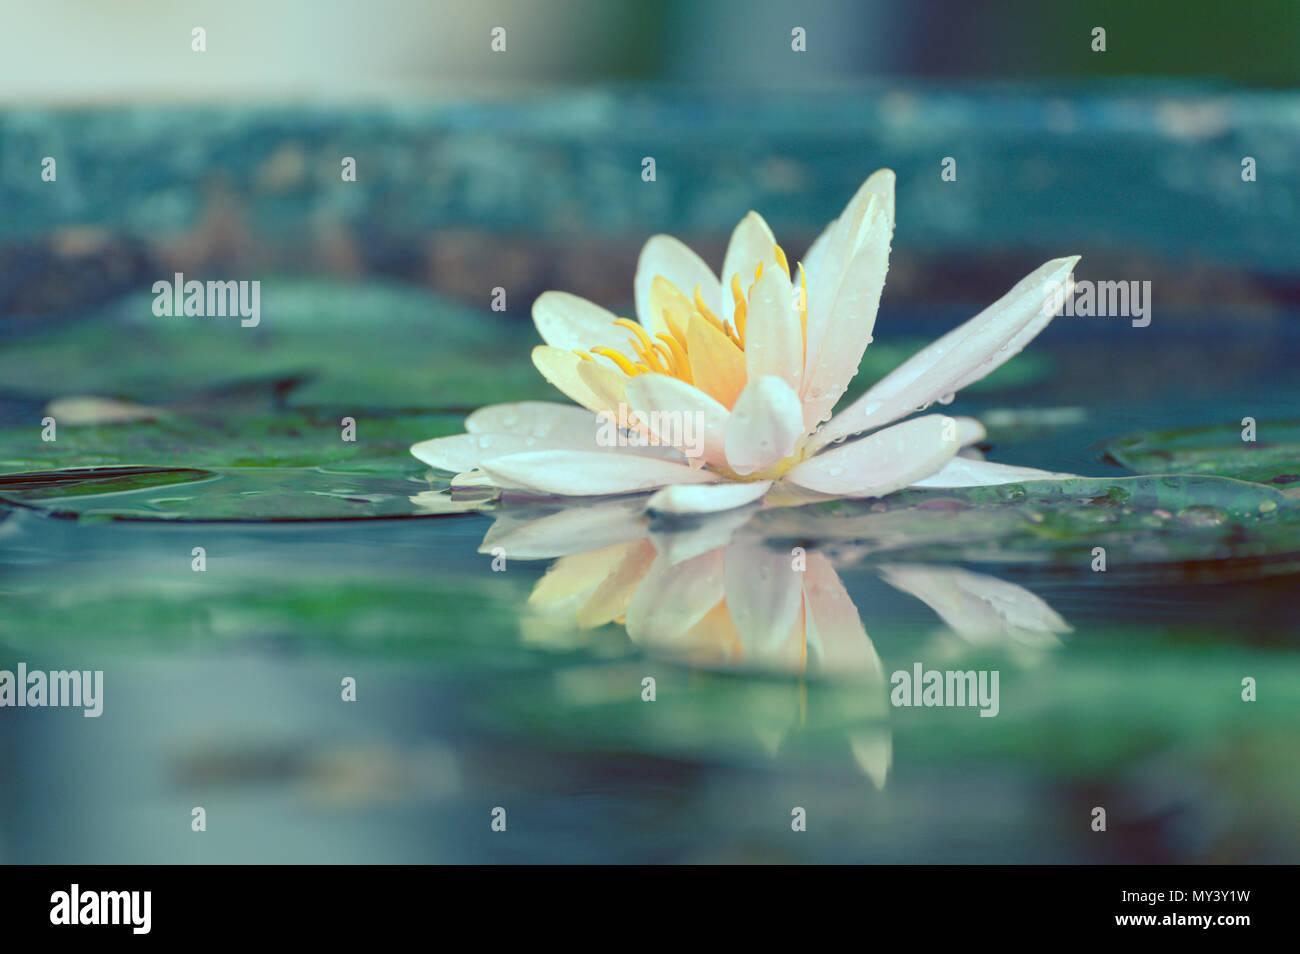 Waterlily Or Lotus Flower In A Pond With Rain Drop Pastel Or Vintage